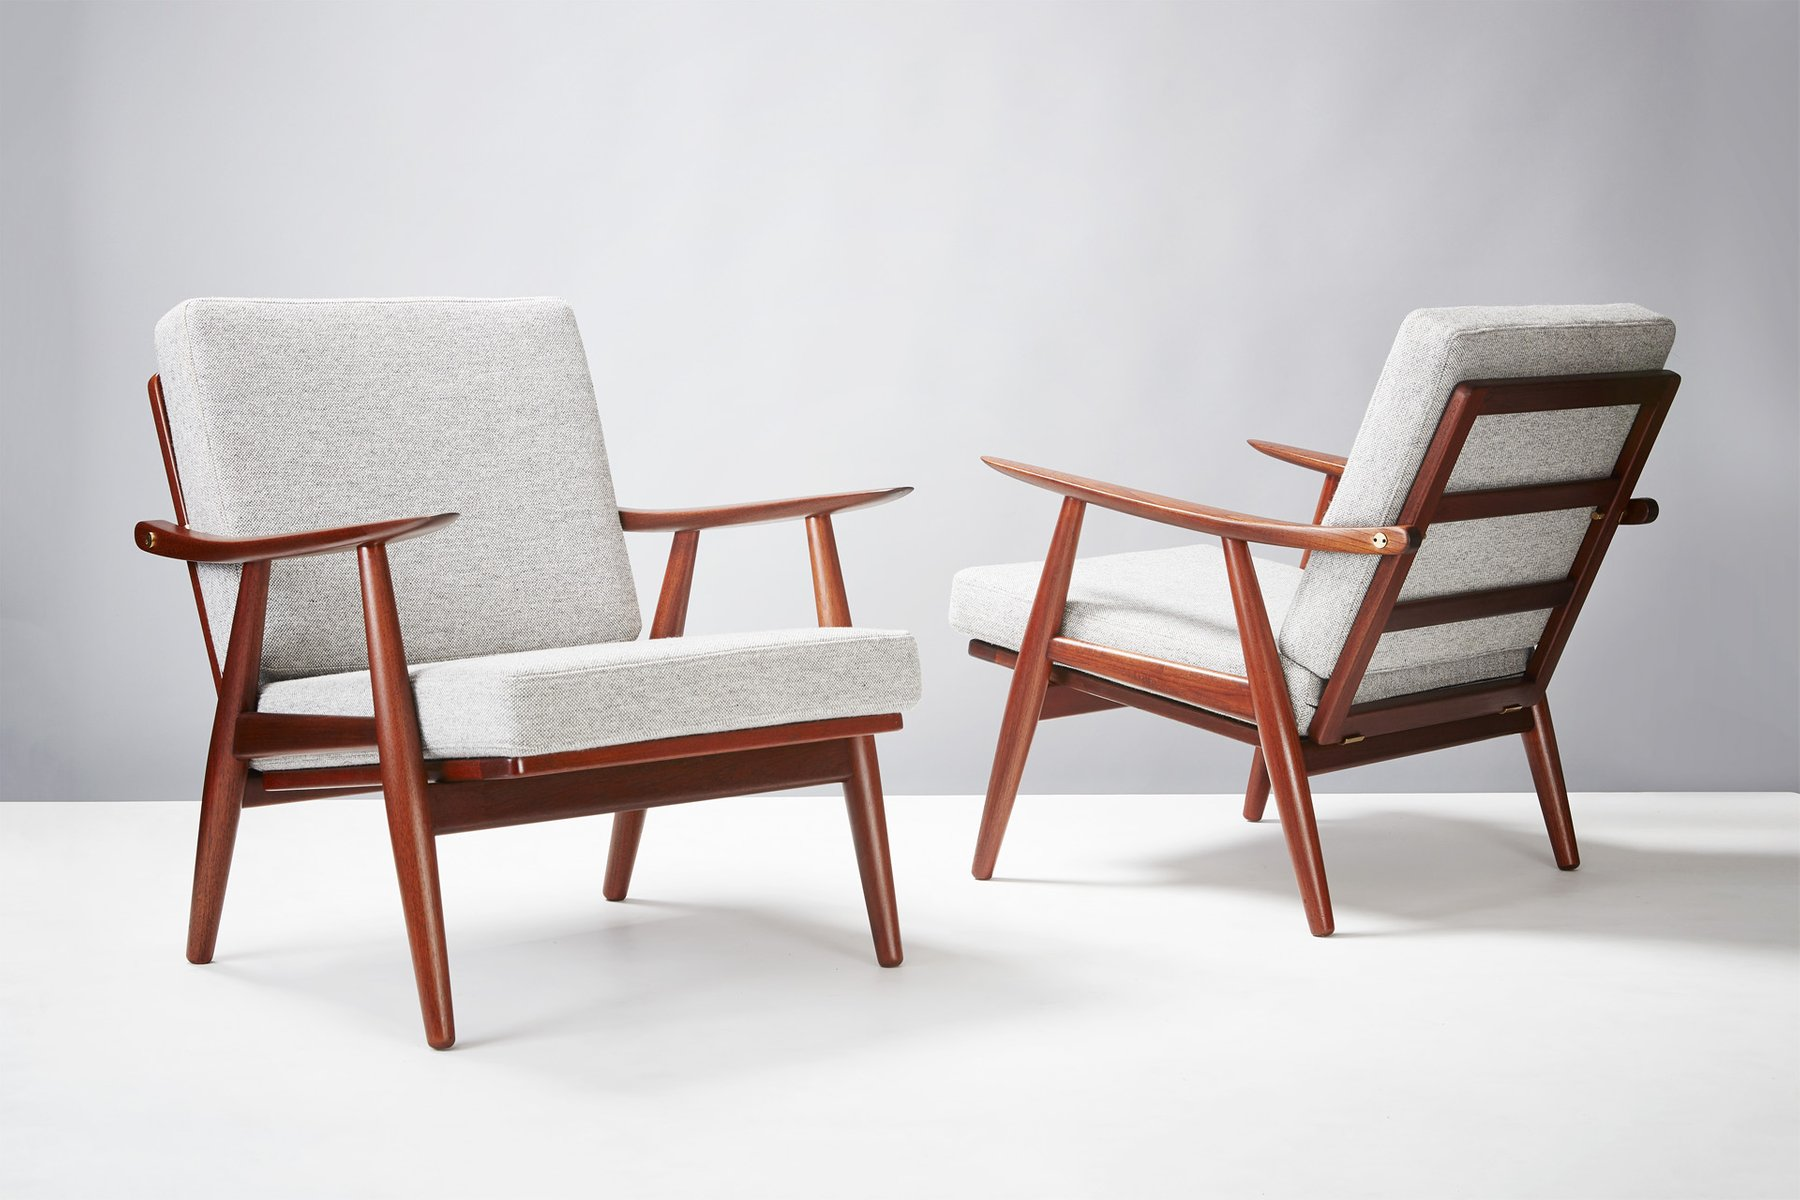 hans wegner peacock chair. GE-270 Chairs By Hans Wegner For Getama, 1956 Peacock Chair E